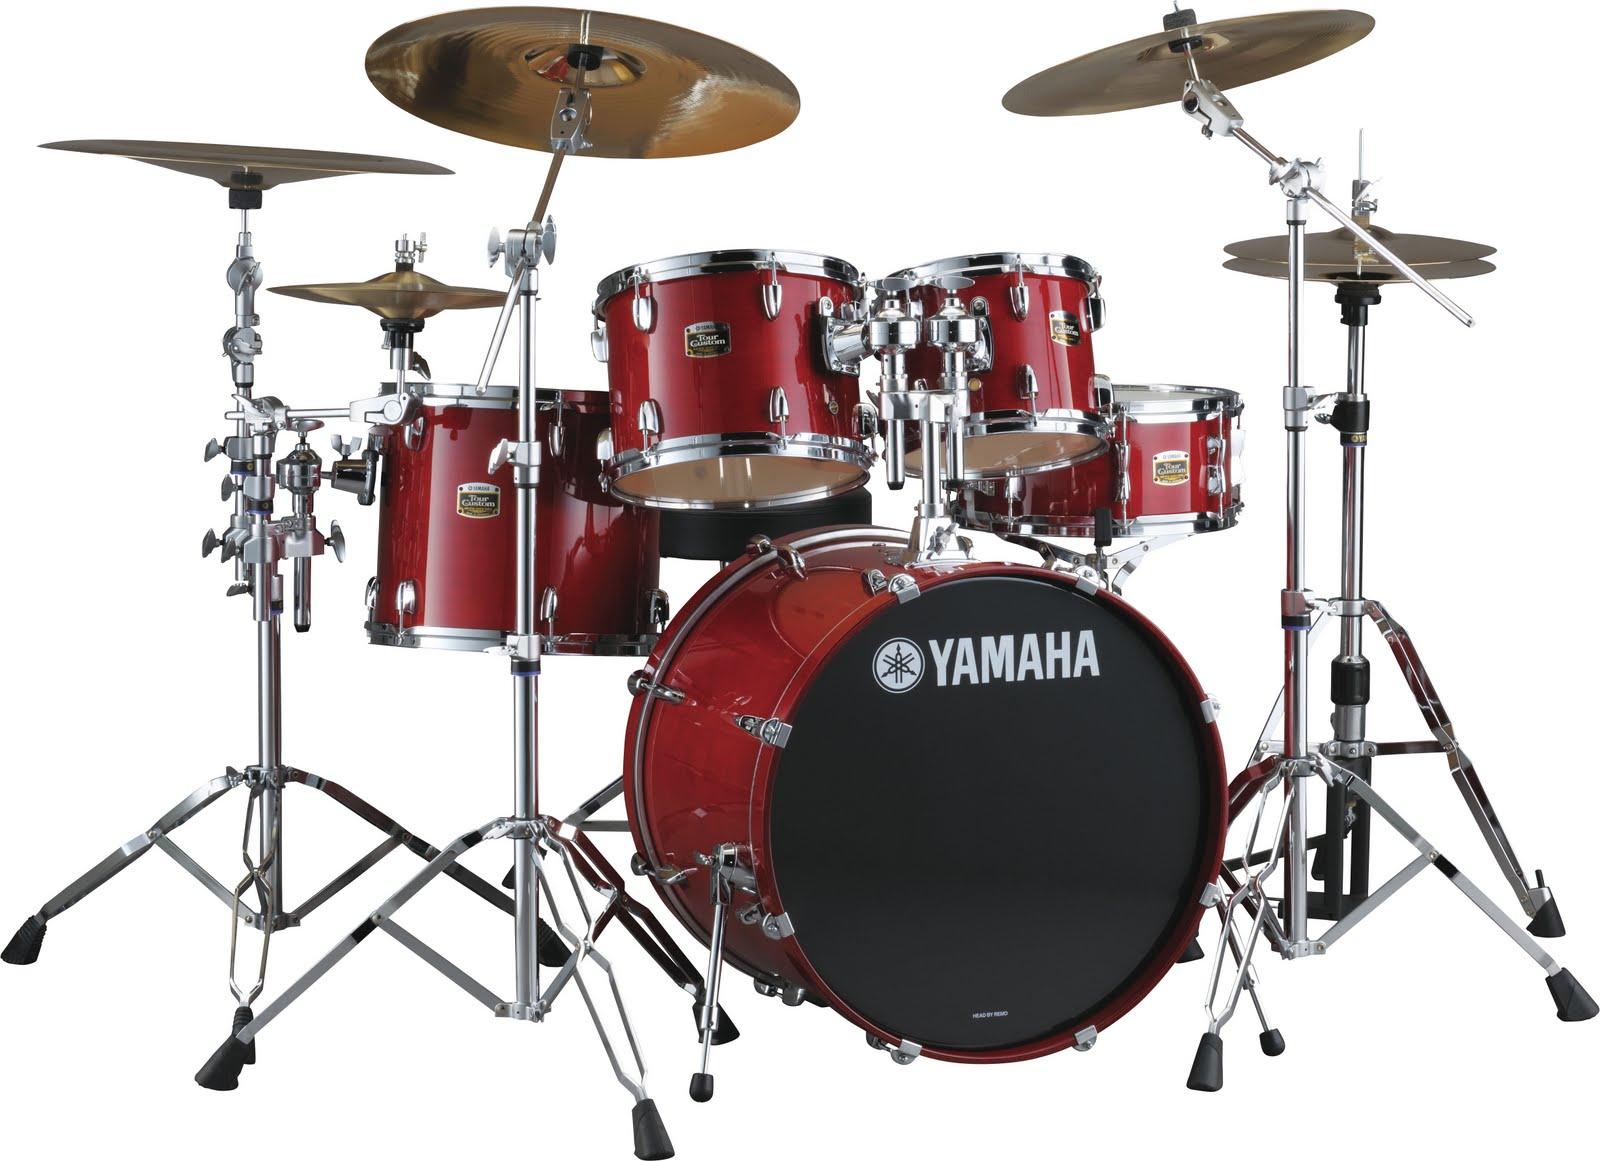 Yamaha Tour Custom Series Drum Set Find Your Drum Set Drum Kits